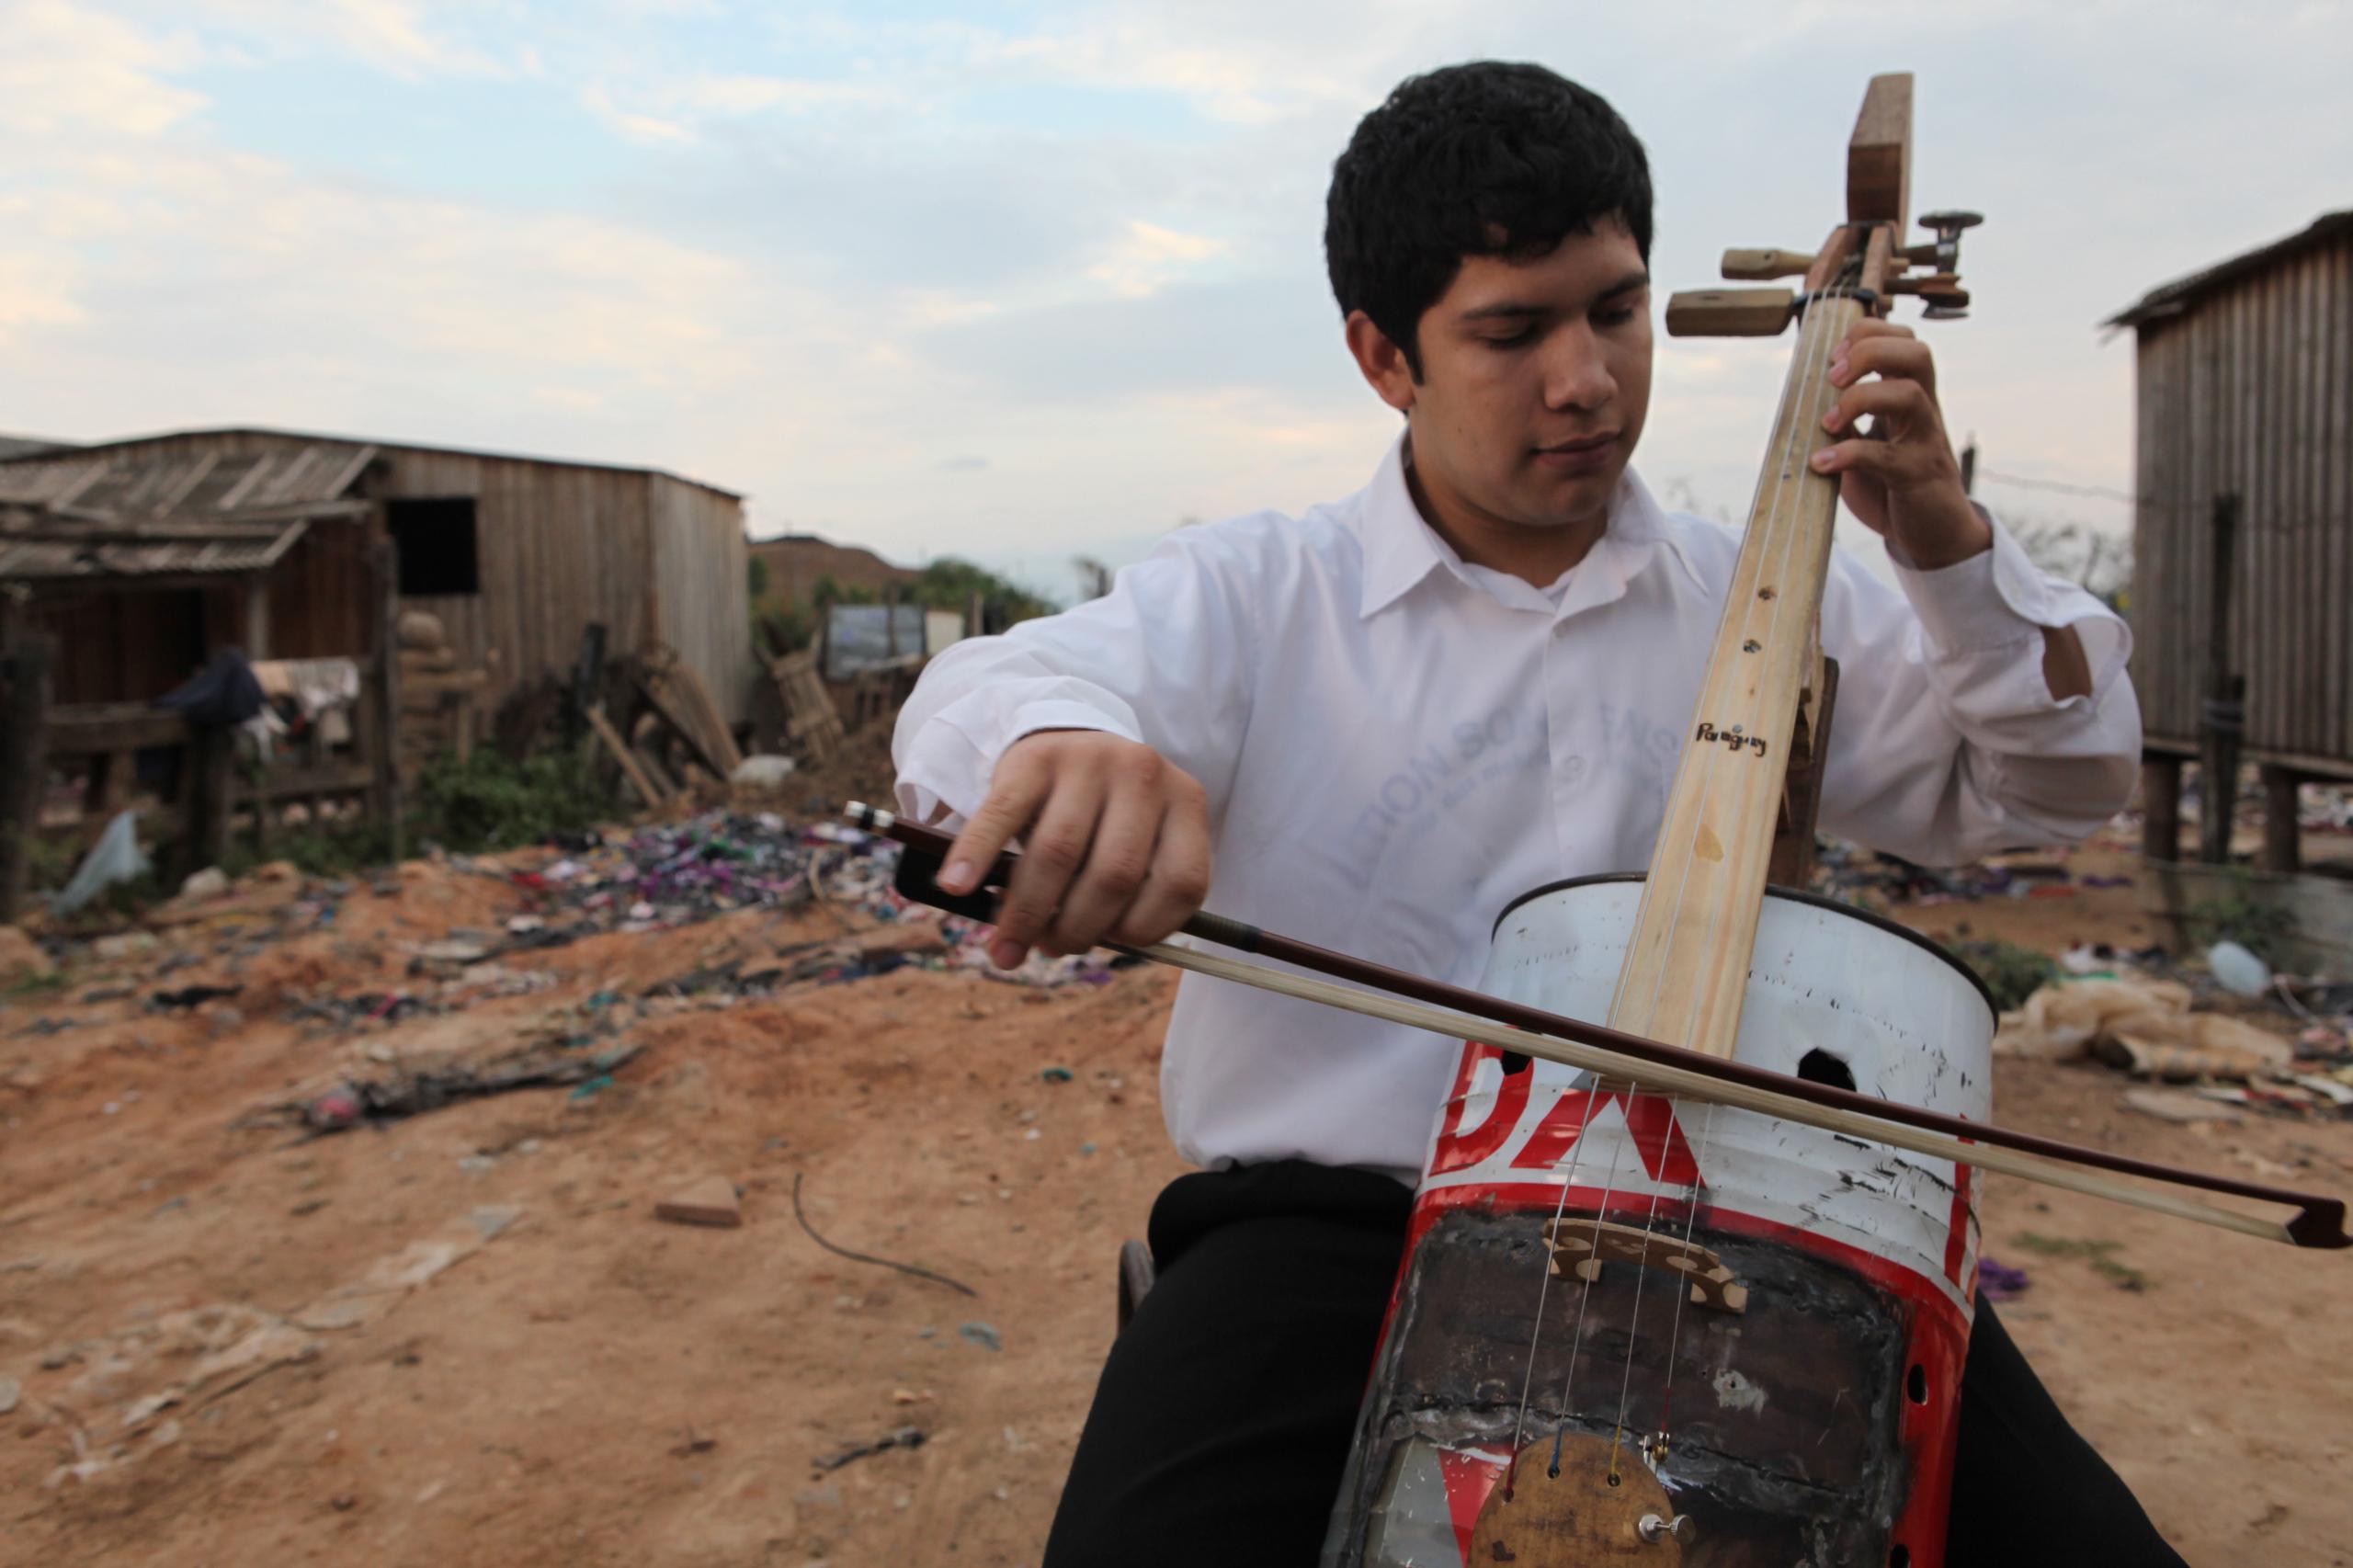 La musique recyclée